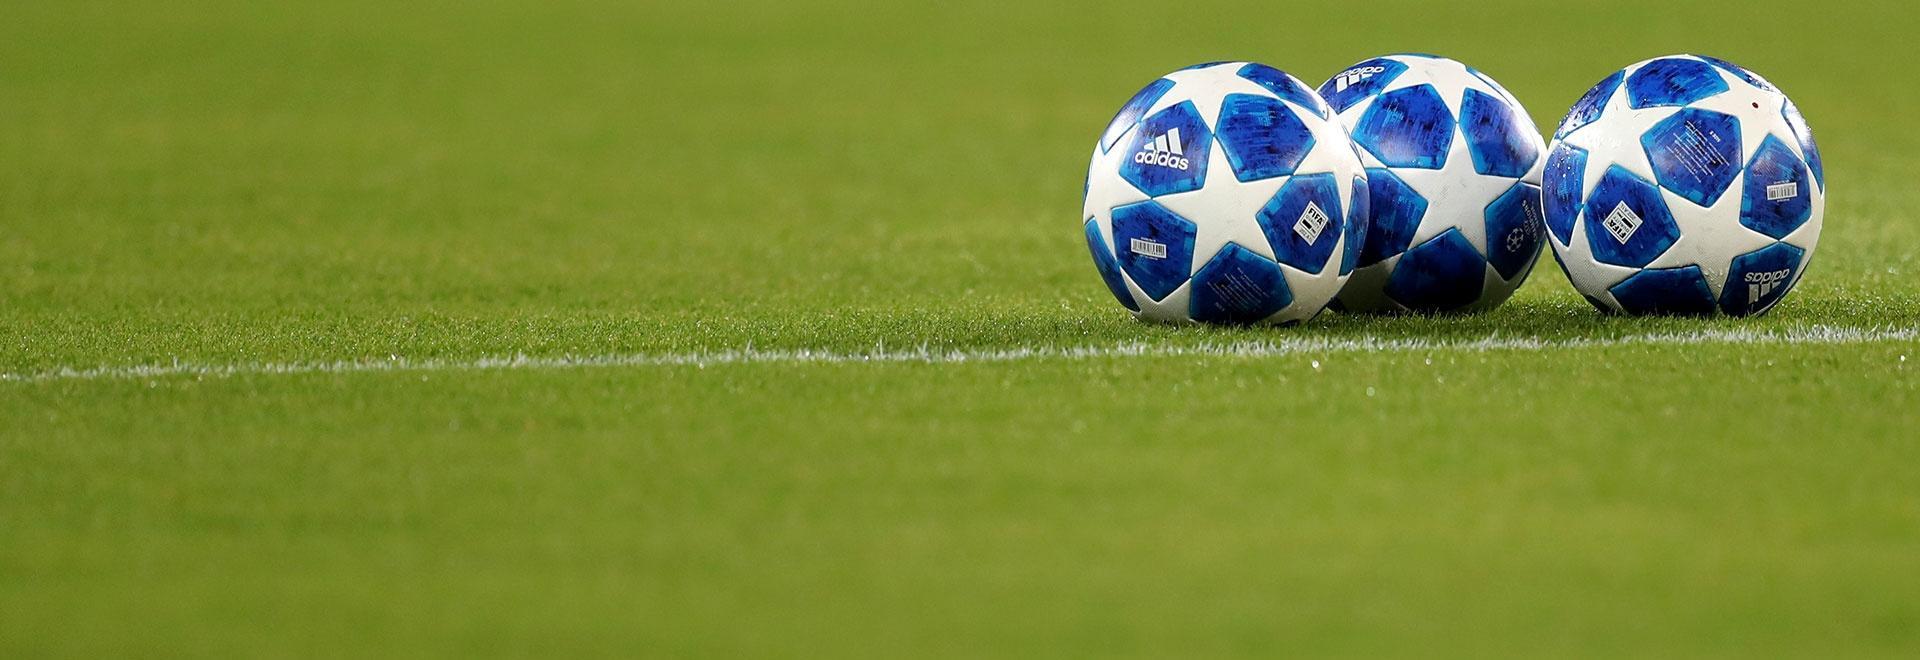 Inter - Dinamo Kiev 04/11/09. Fase a gironi. 3a giornata